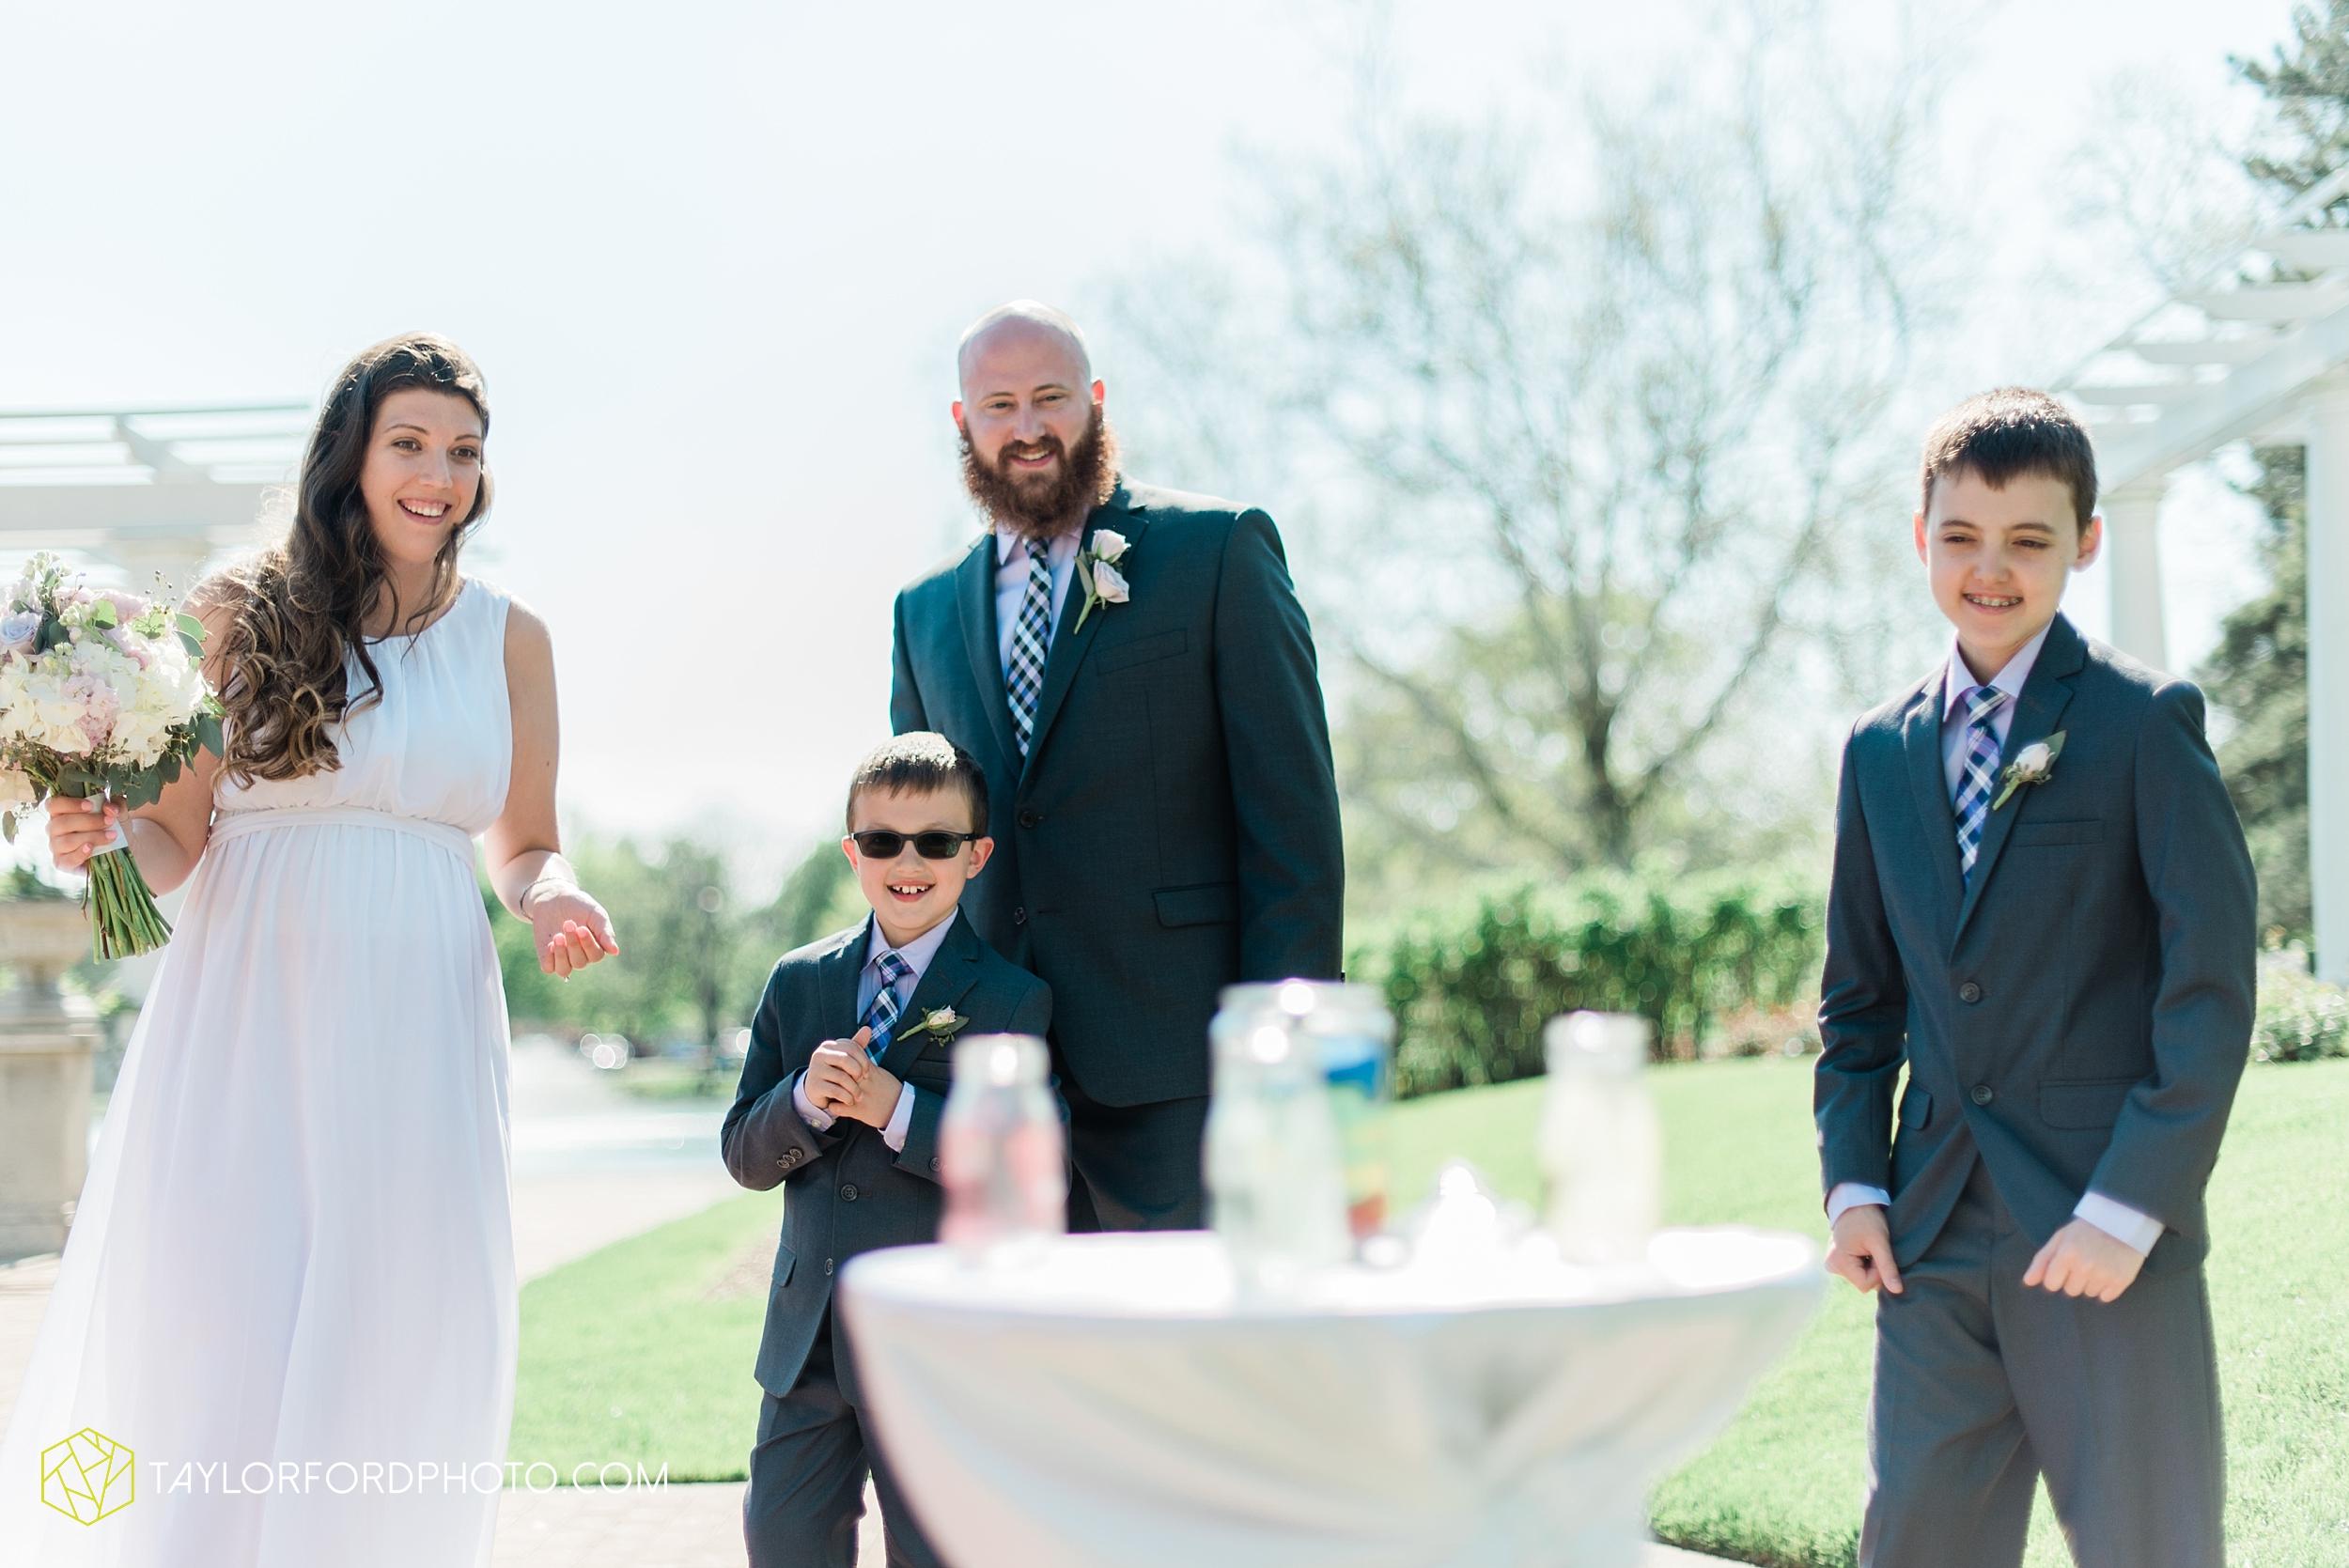 lakeside-rose-gardens-fort-wayne-indiana-elopement-wedding-photographer-Taylor-Ford-Photography_7150.jpg